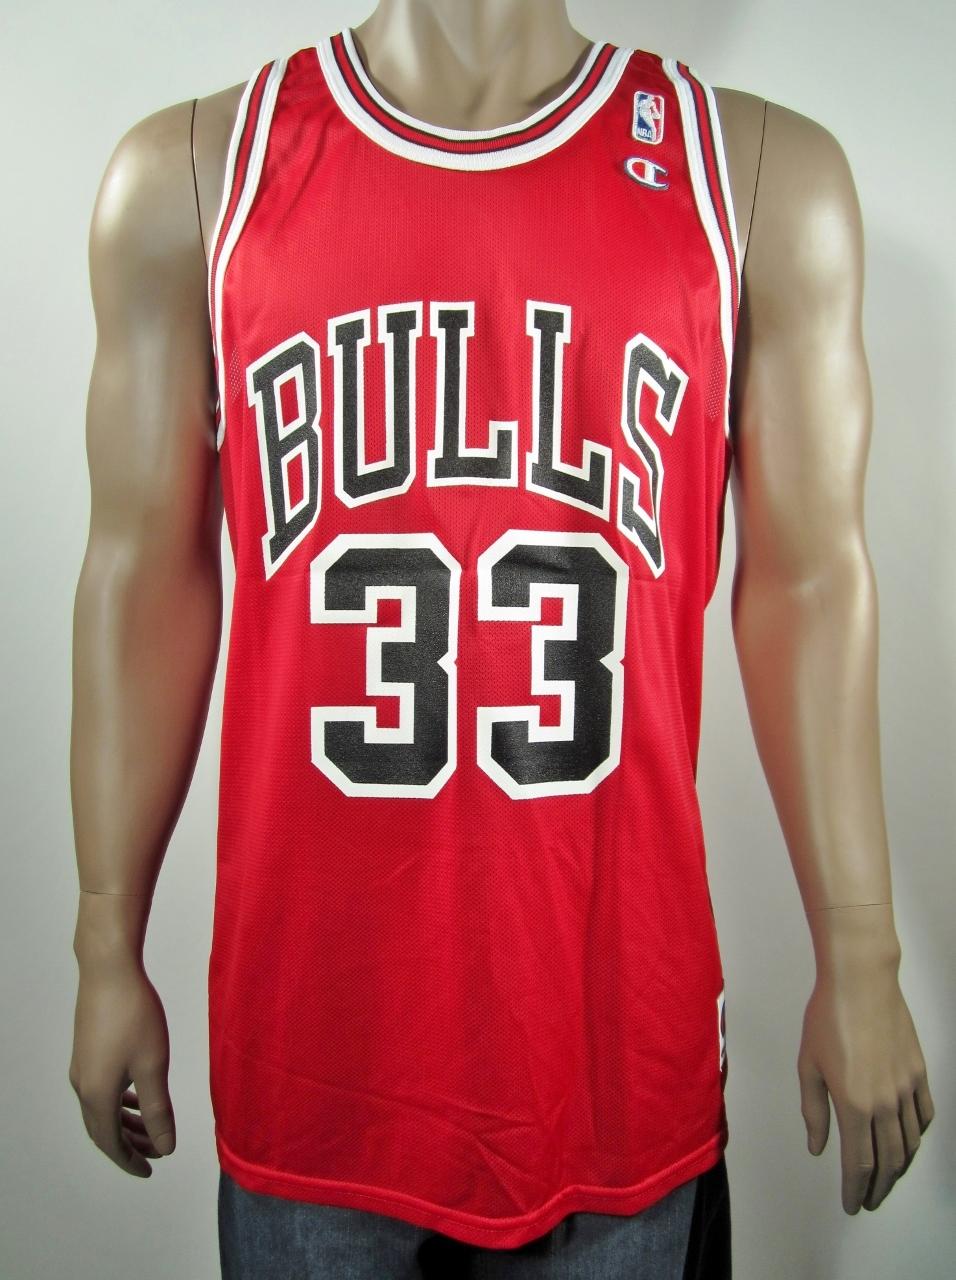 948b9b3e555 Scottie Pippen Chicago Bulls Champion Jersey 48 NWT · DFRNSH8 ...